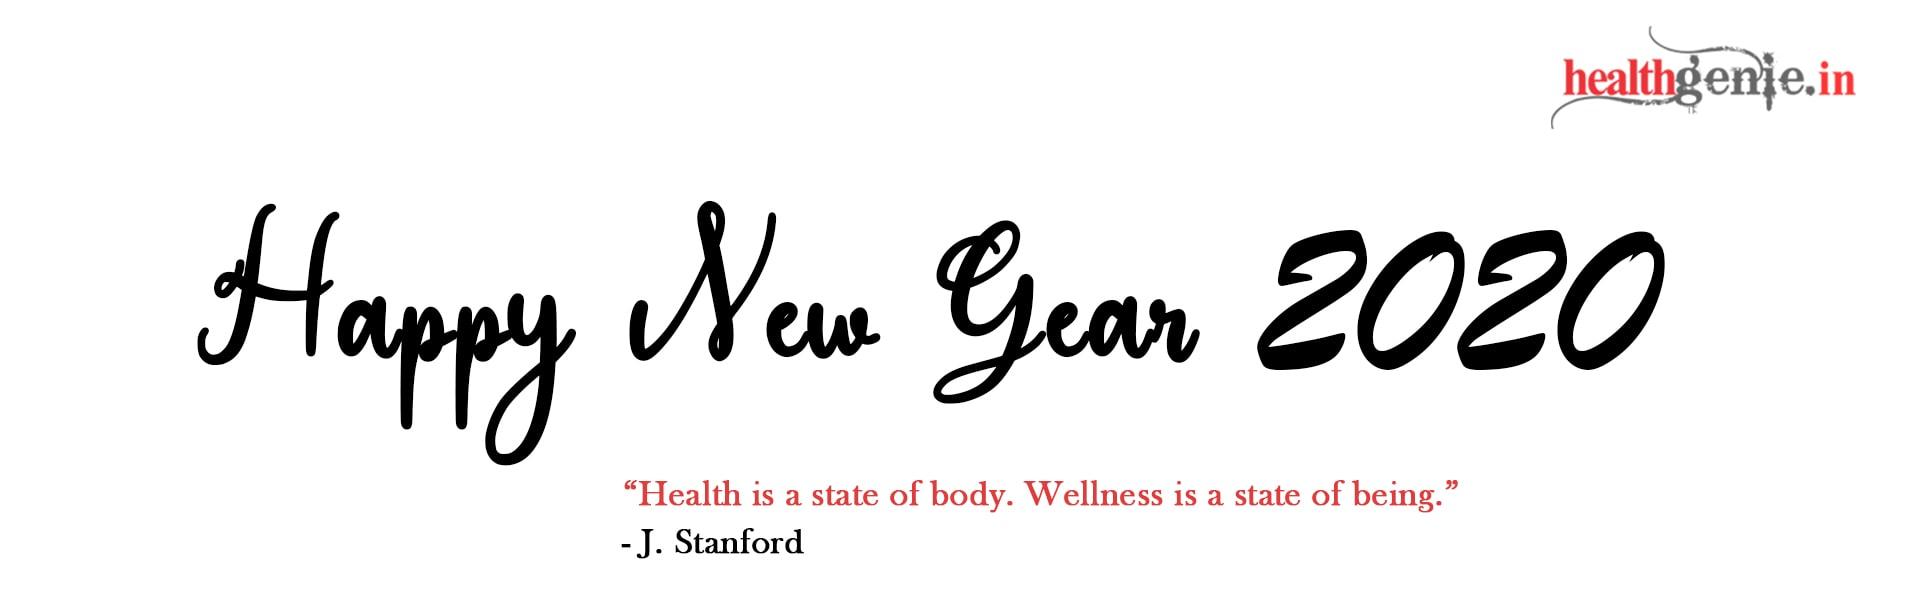 Healthgenie Happy New Year 2020 Min